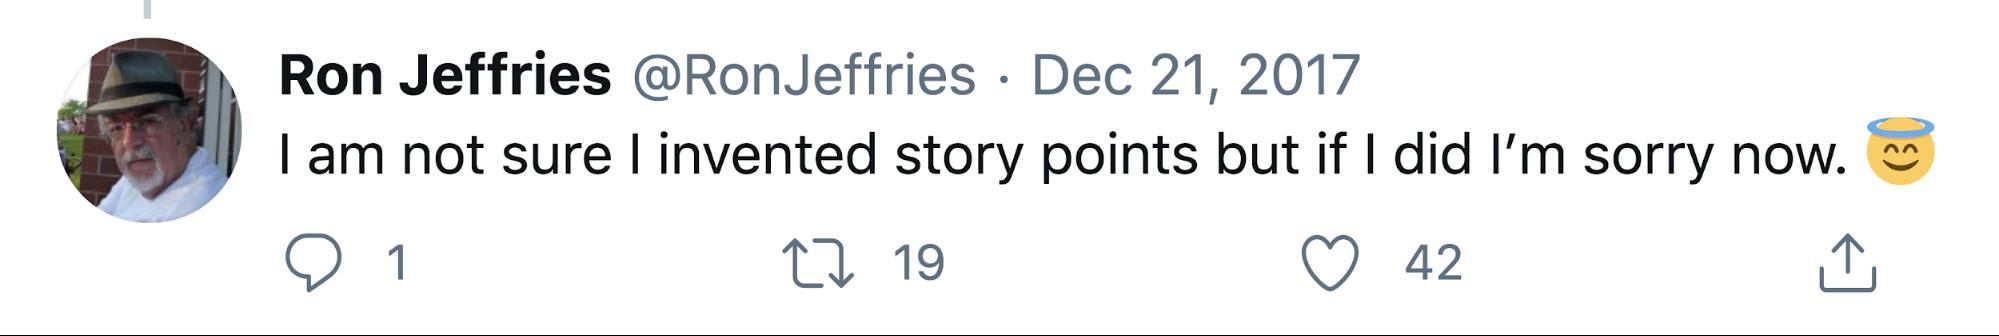 Ron Jeffries - Story points tweet